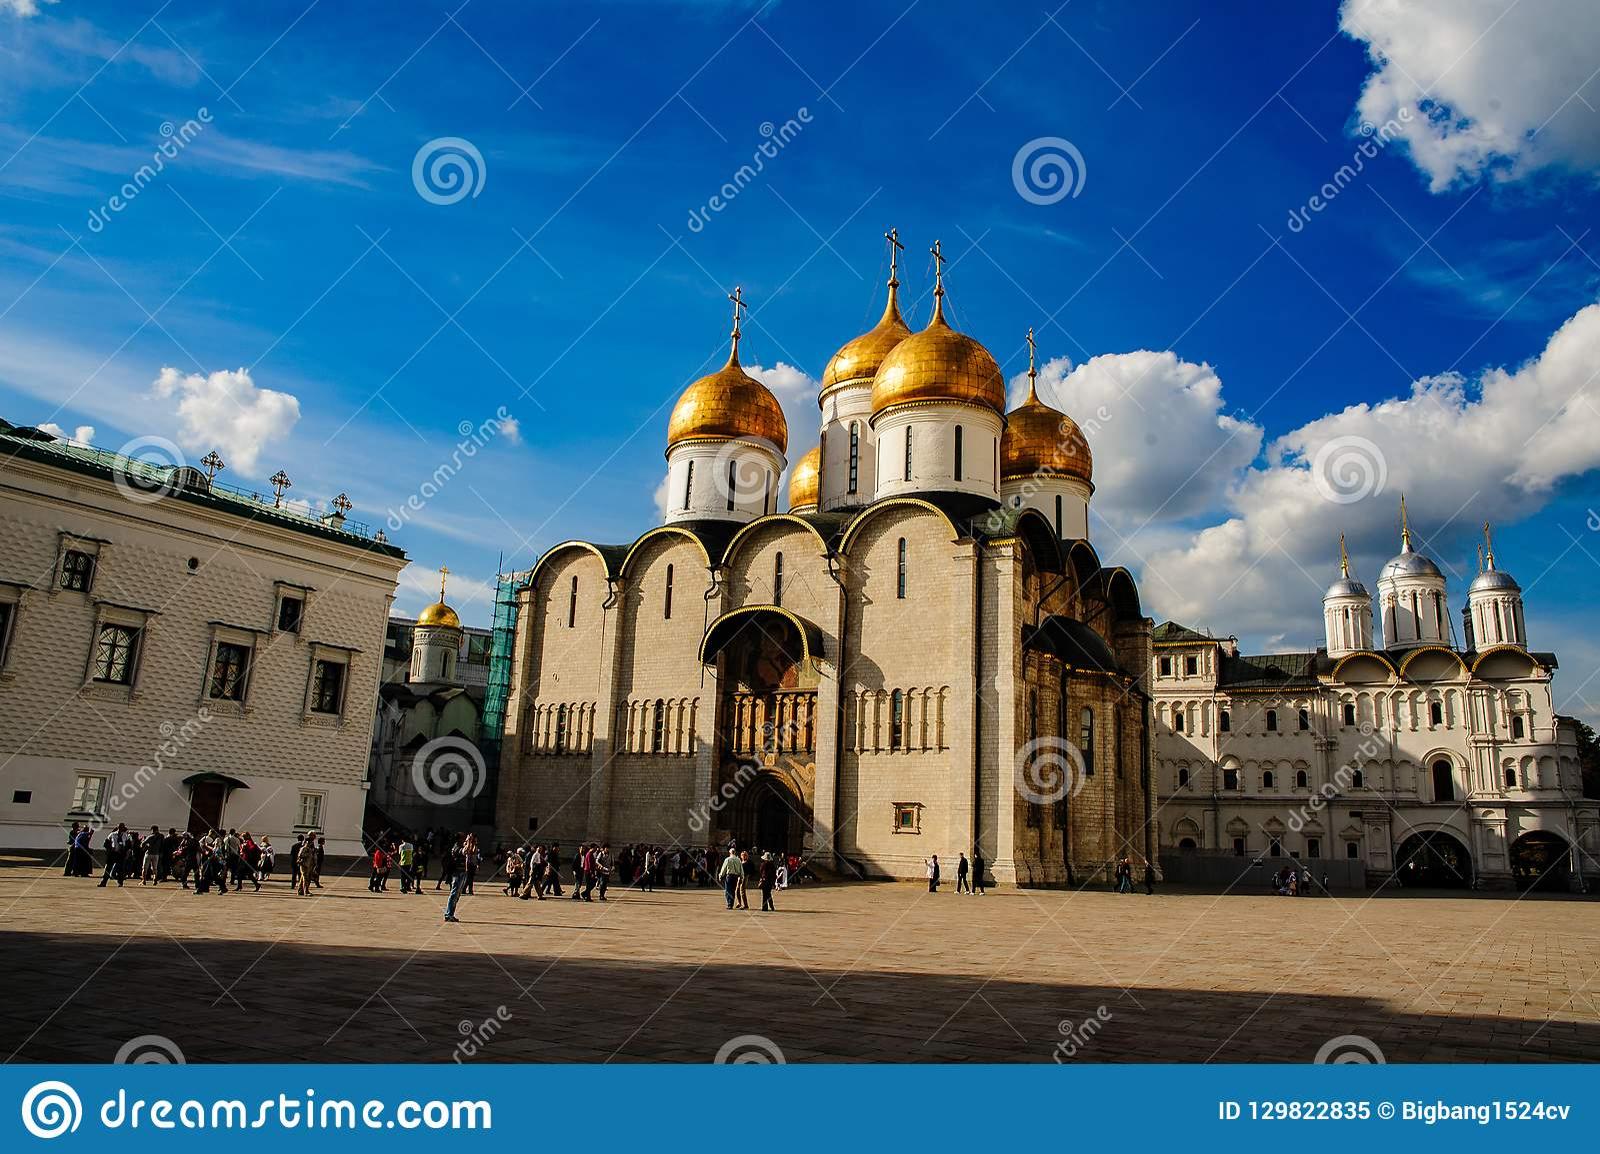 La catedral de Uspensky en el Kremlin, Moscú